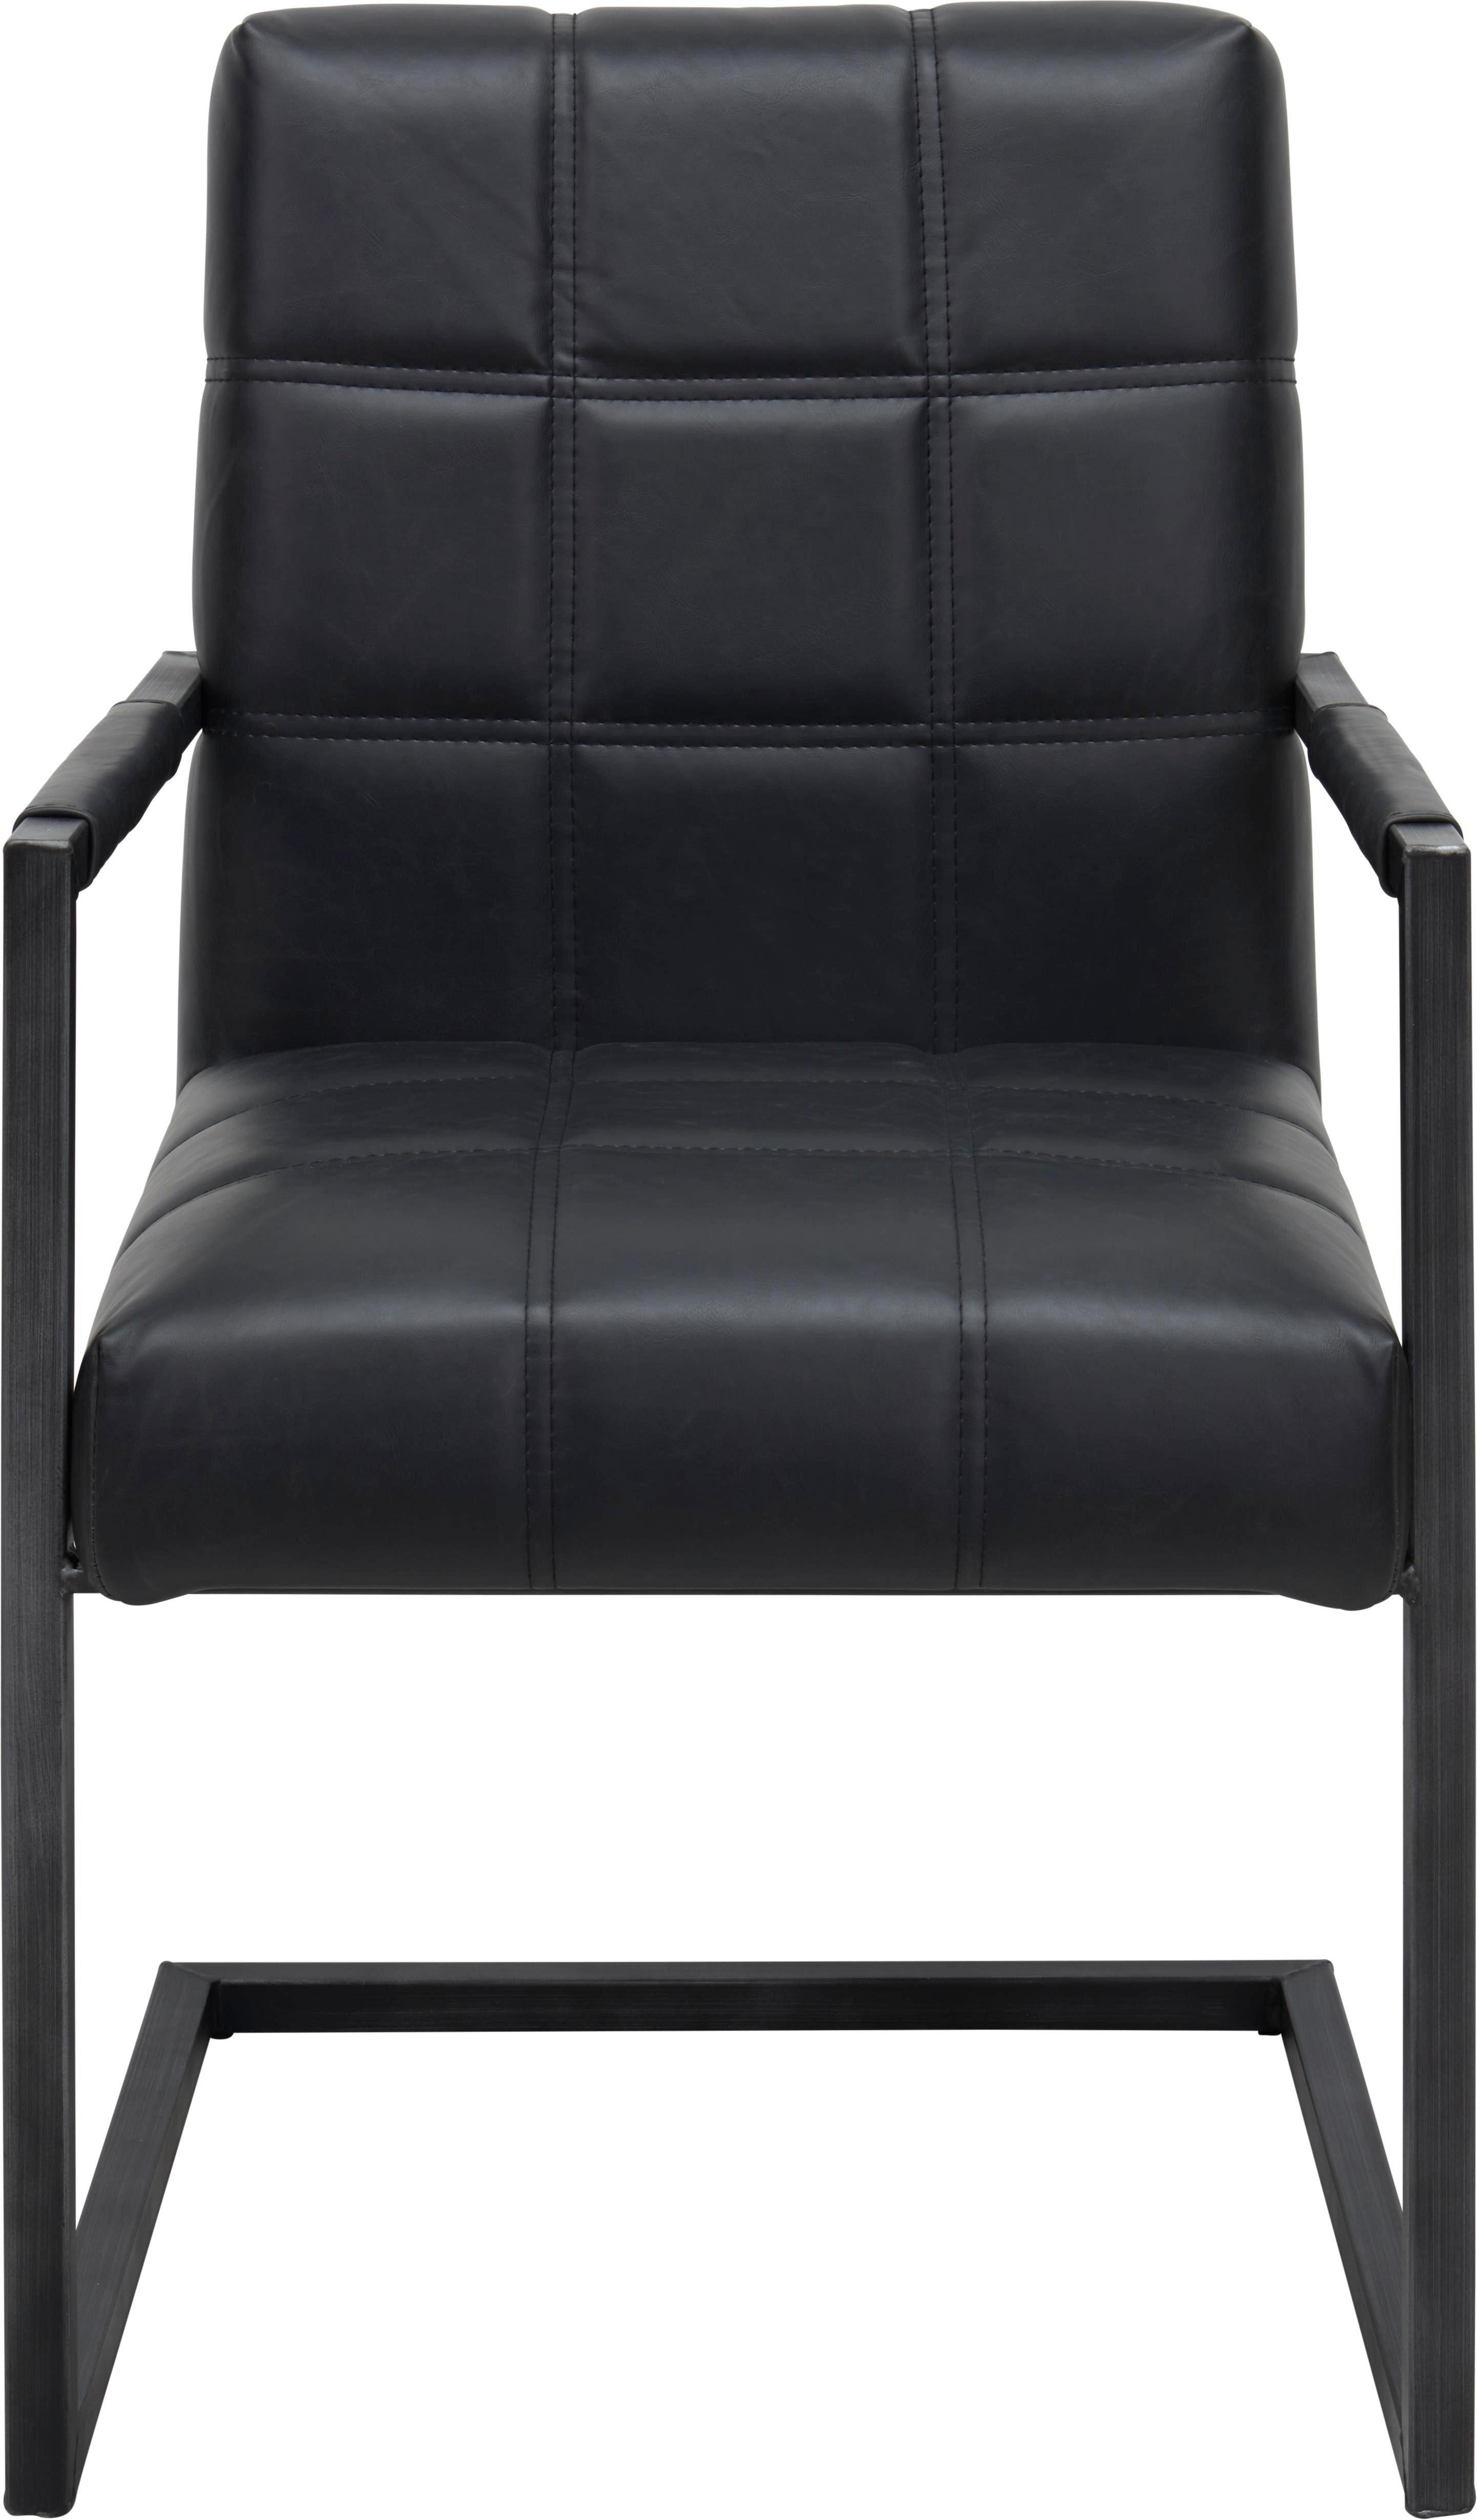 STOL - svart, Trend, metall/textil (55/92/63cm) - Ambia Home